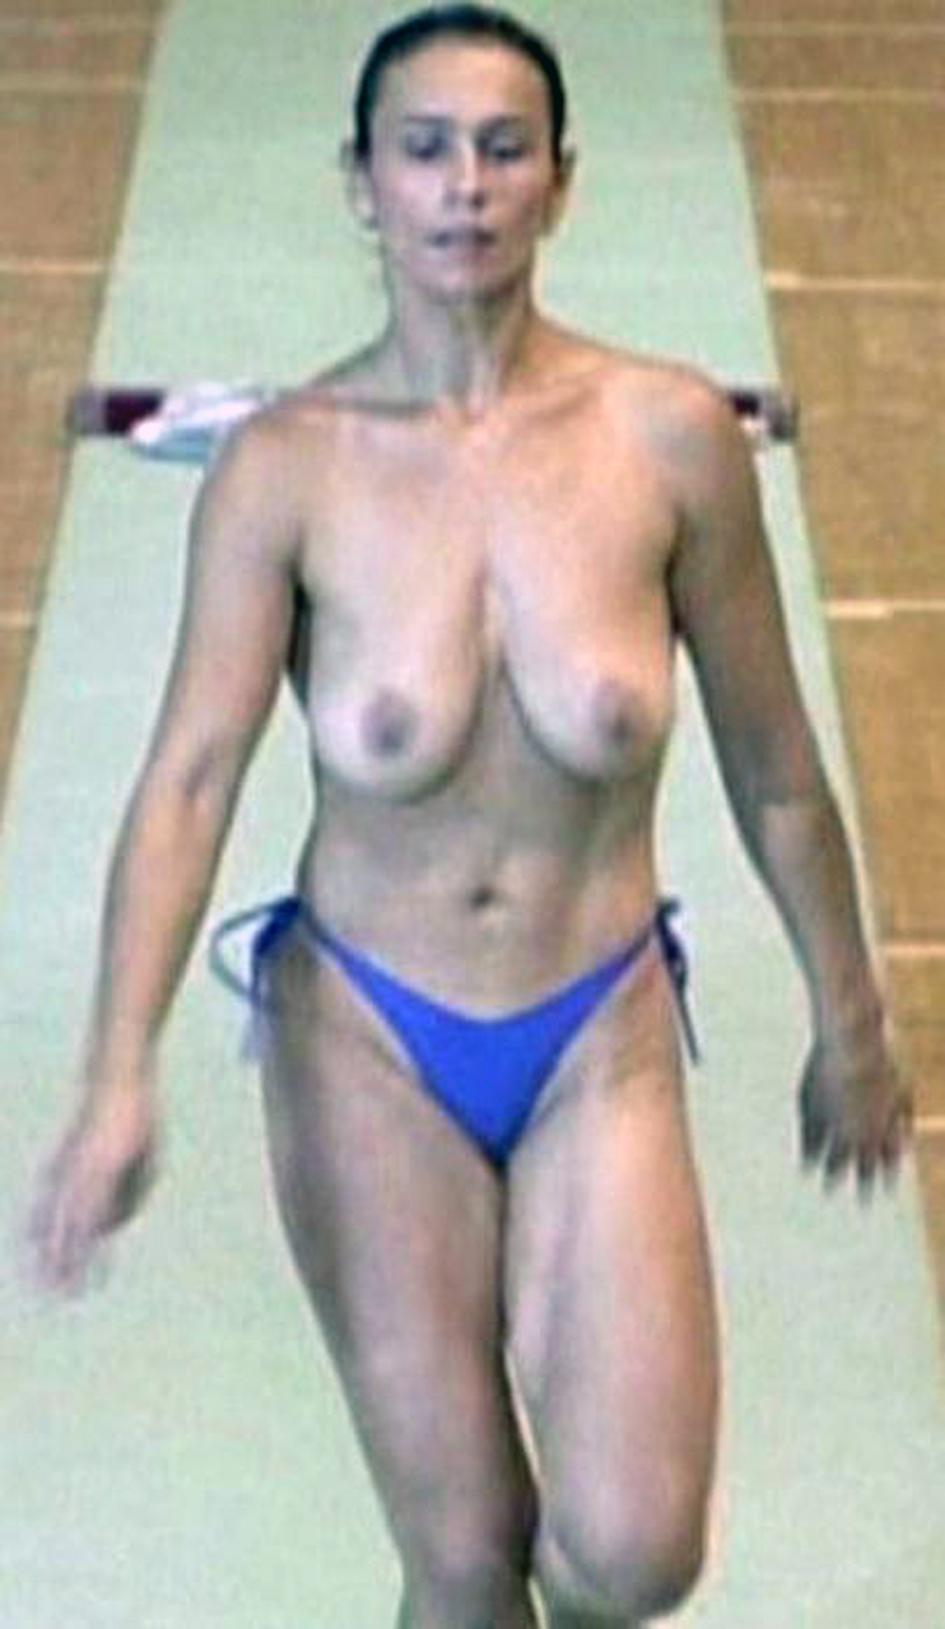 largest boob size